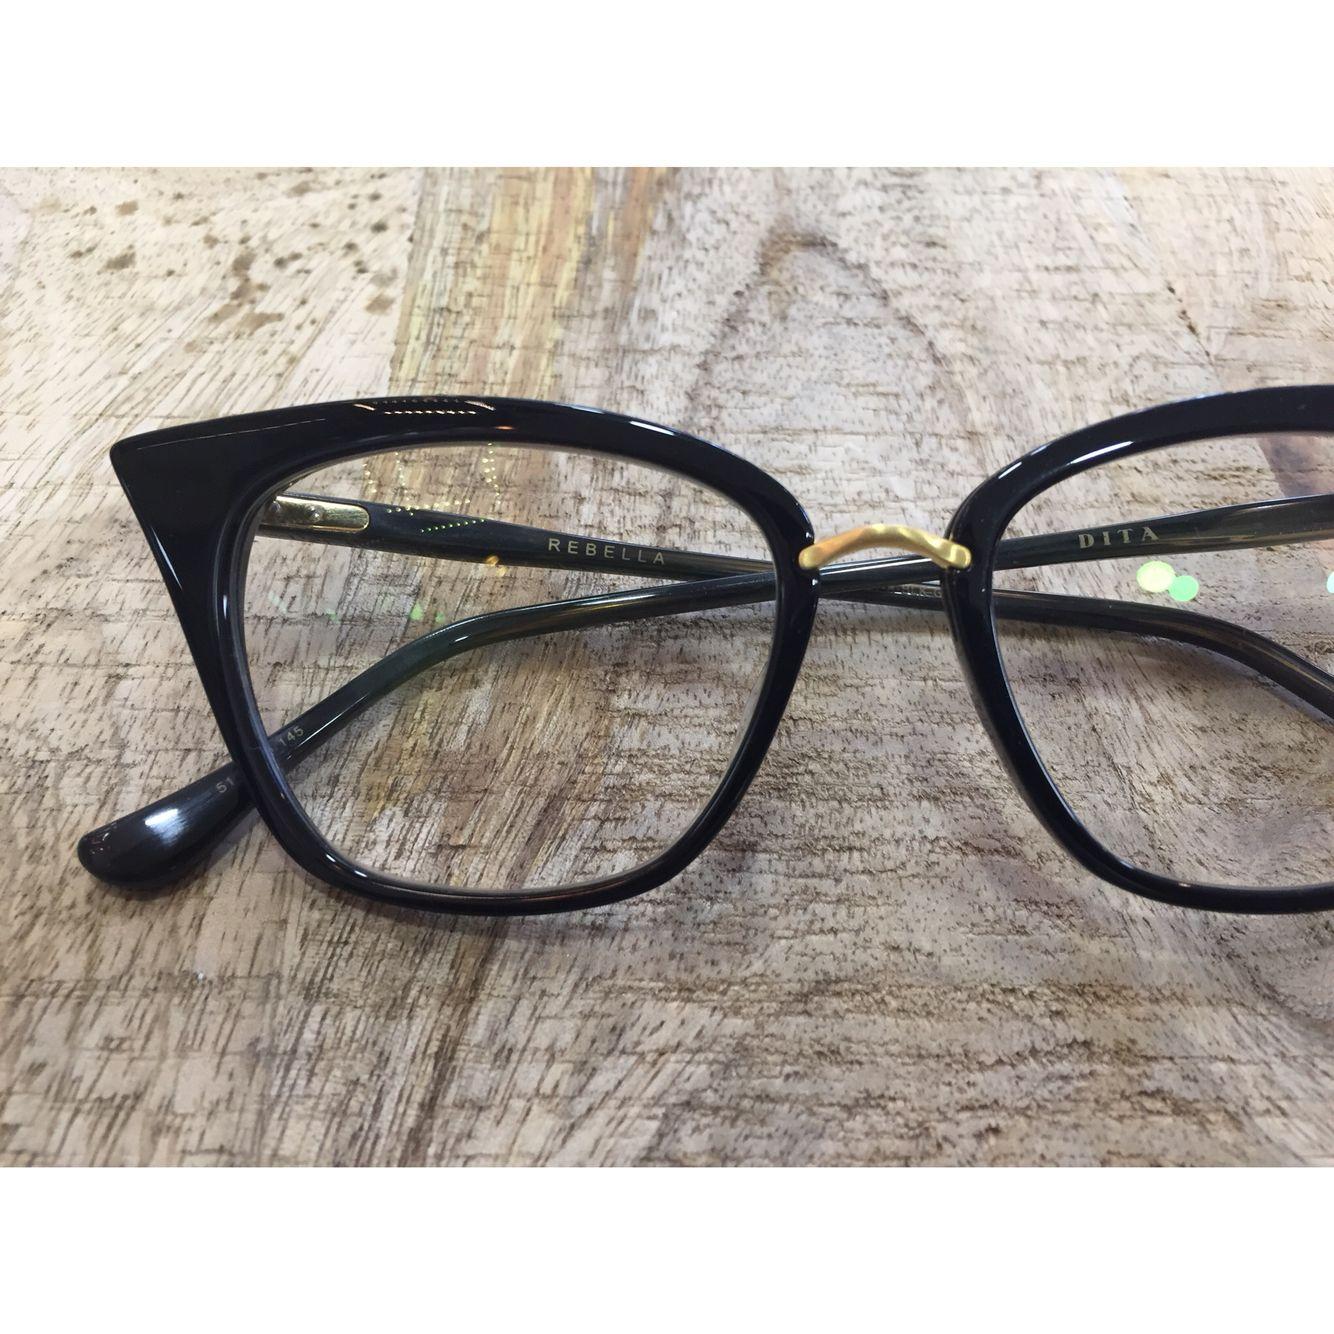 Dita Rebella   un style incomparable !  lunettes  eyewear ... cc9cf19c1c